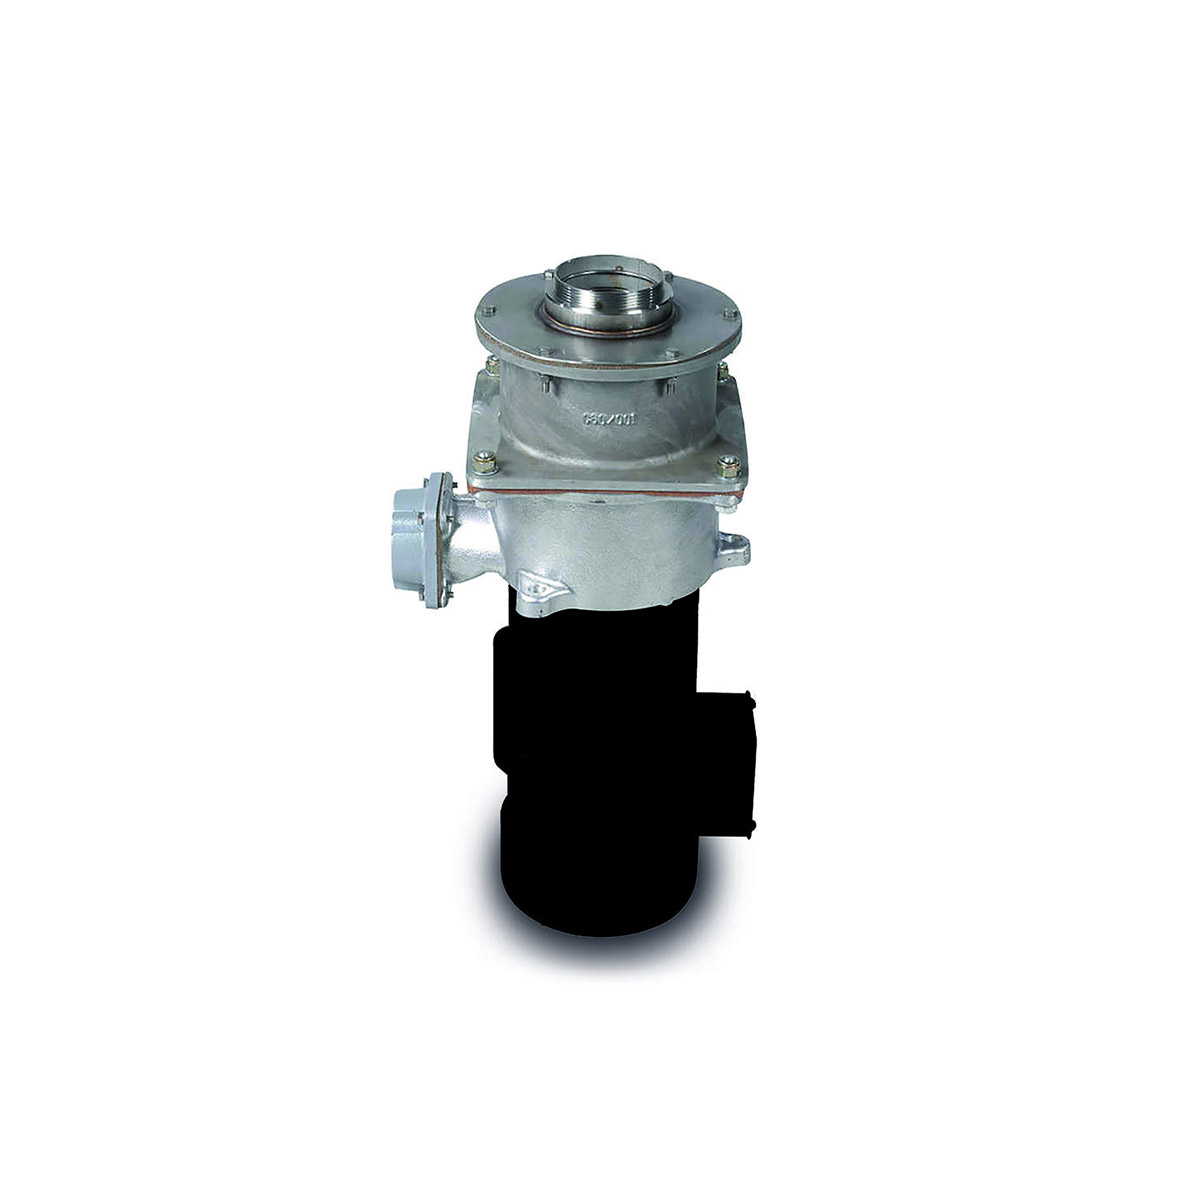 F60/305 - IMC Vulture 723 Under-sink Food Waste Disposer - fits 89 mm sink opening - 1 Phase - 1.1 kW